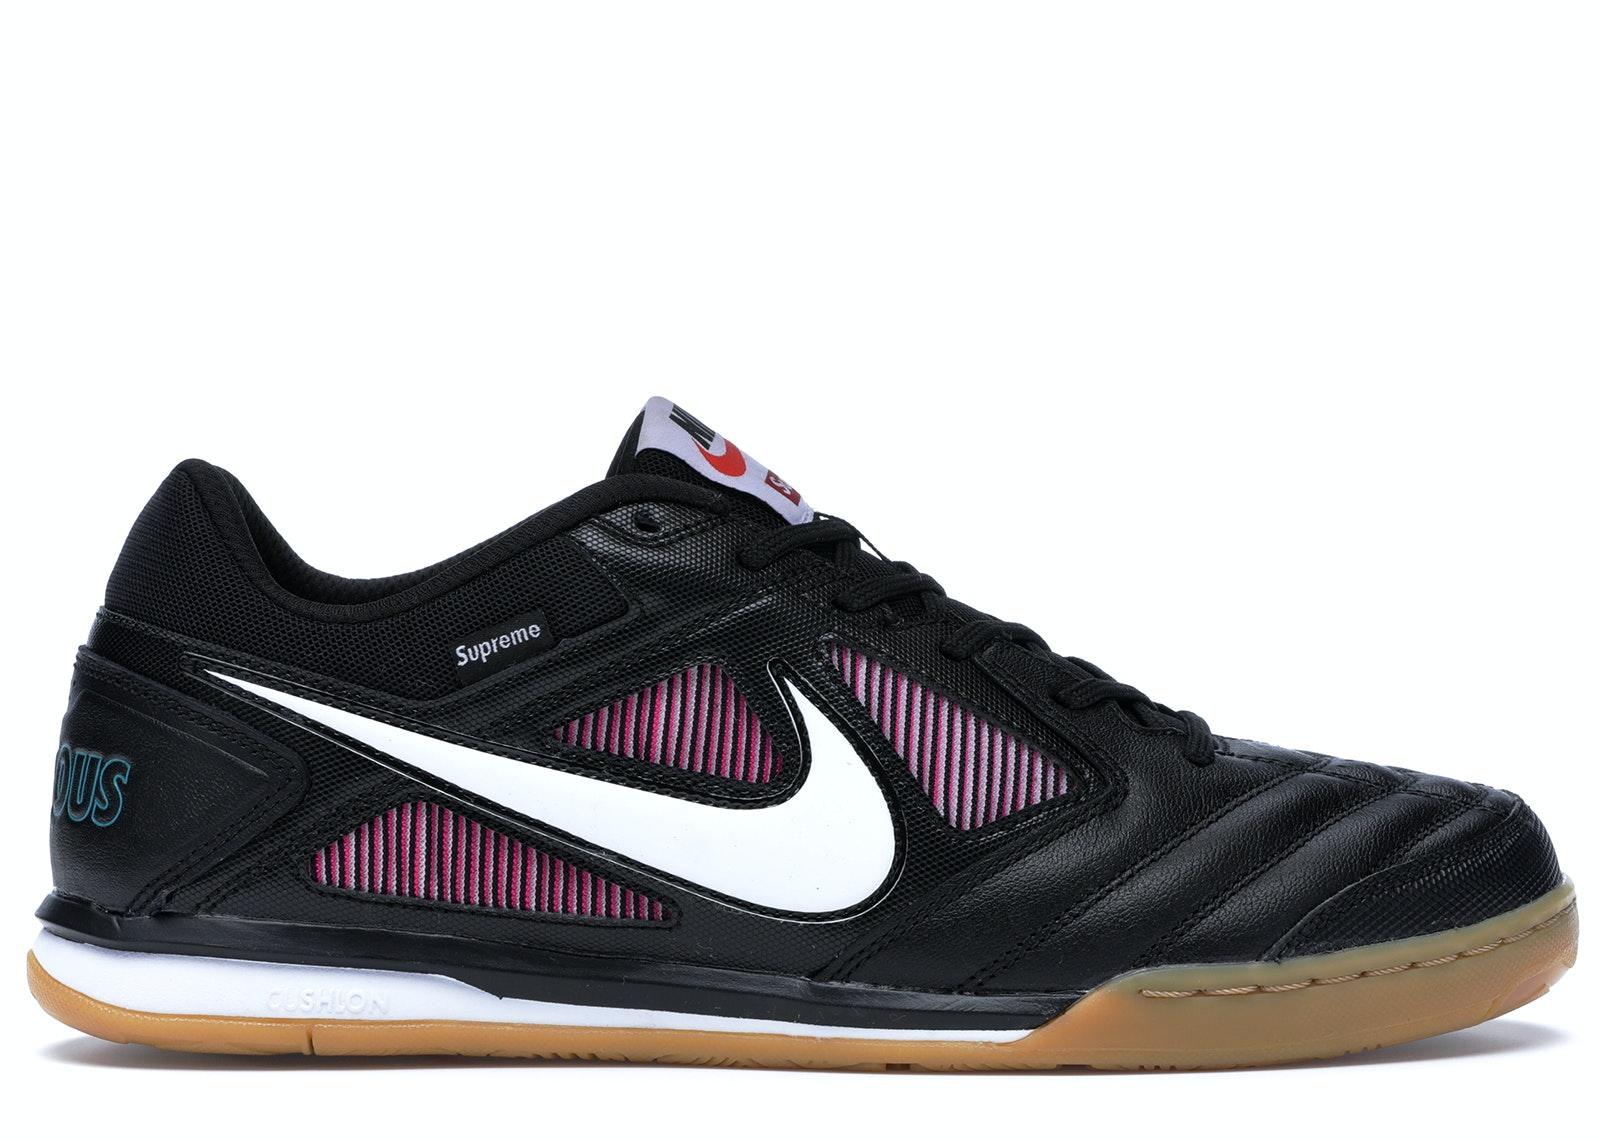 Nike SB Gato Supreme Black